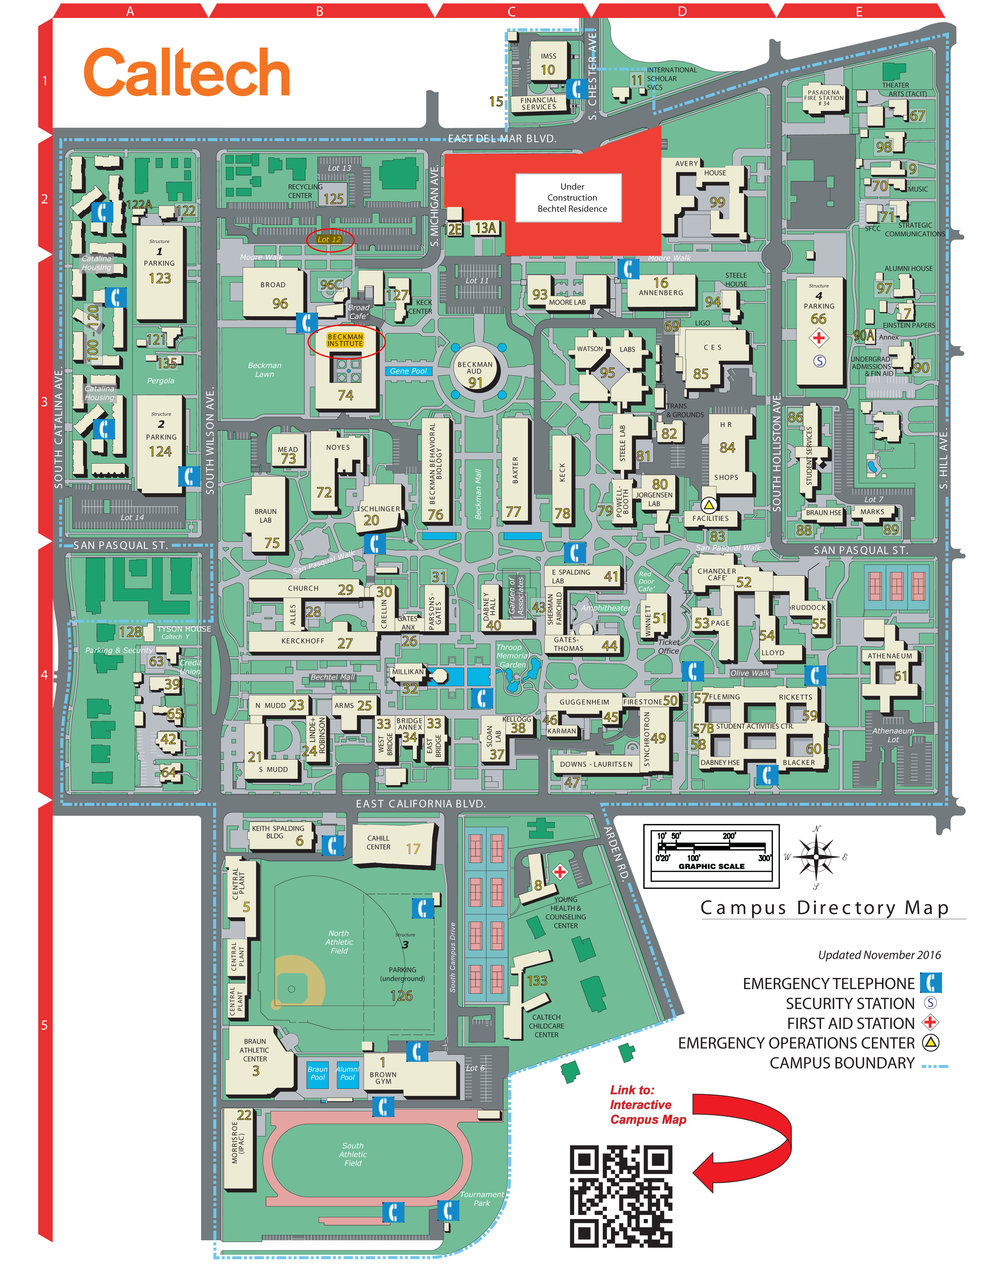 Bathroom 2018: Caltech Map on spalding campus map, hawaii campus map, ut brownsville campus map, ucla campus map, ge campus map, university of california campus map, oxford campus map, university of chicago campus map, california institute of technology campus map, del mar college west campus map, fermilab campus map, usc campus map, csu east bay campus map, university of toronto campus map, university of maryland campus map, google campus map, university of virginia campus map, tech campus map, pasadena campus map, university college london campus map,